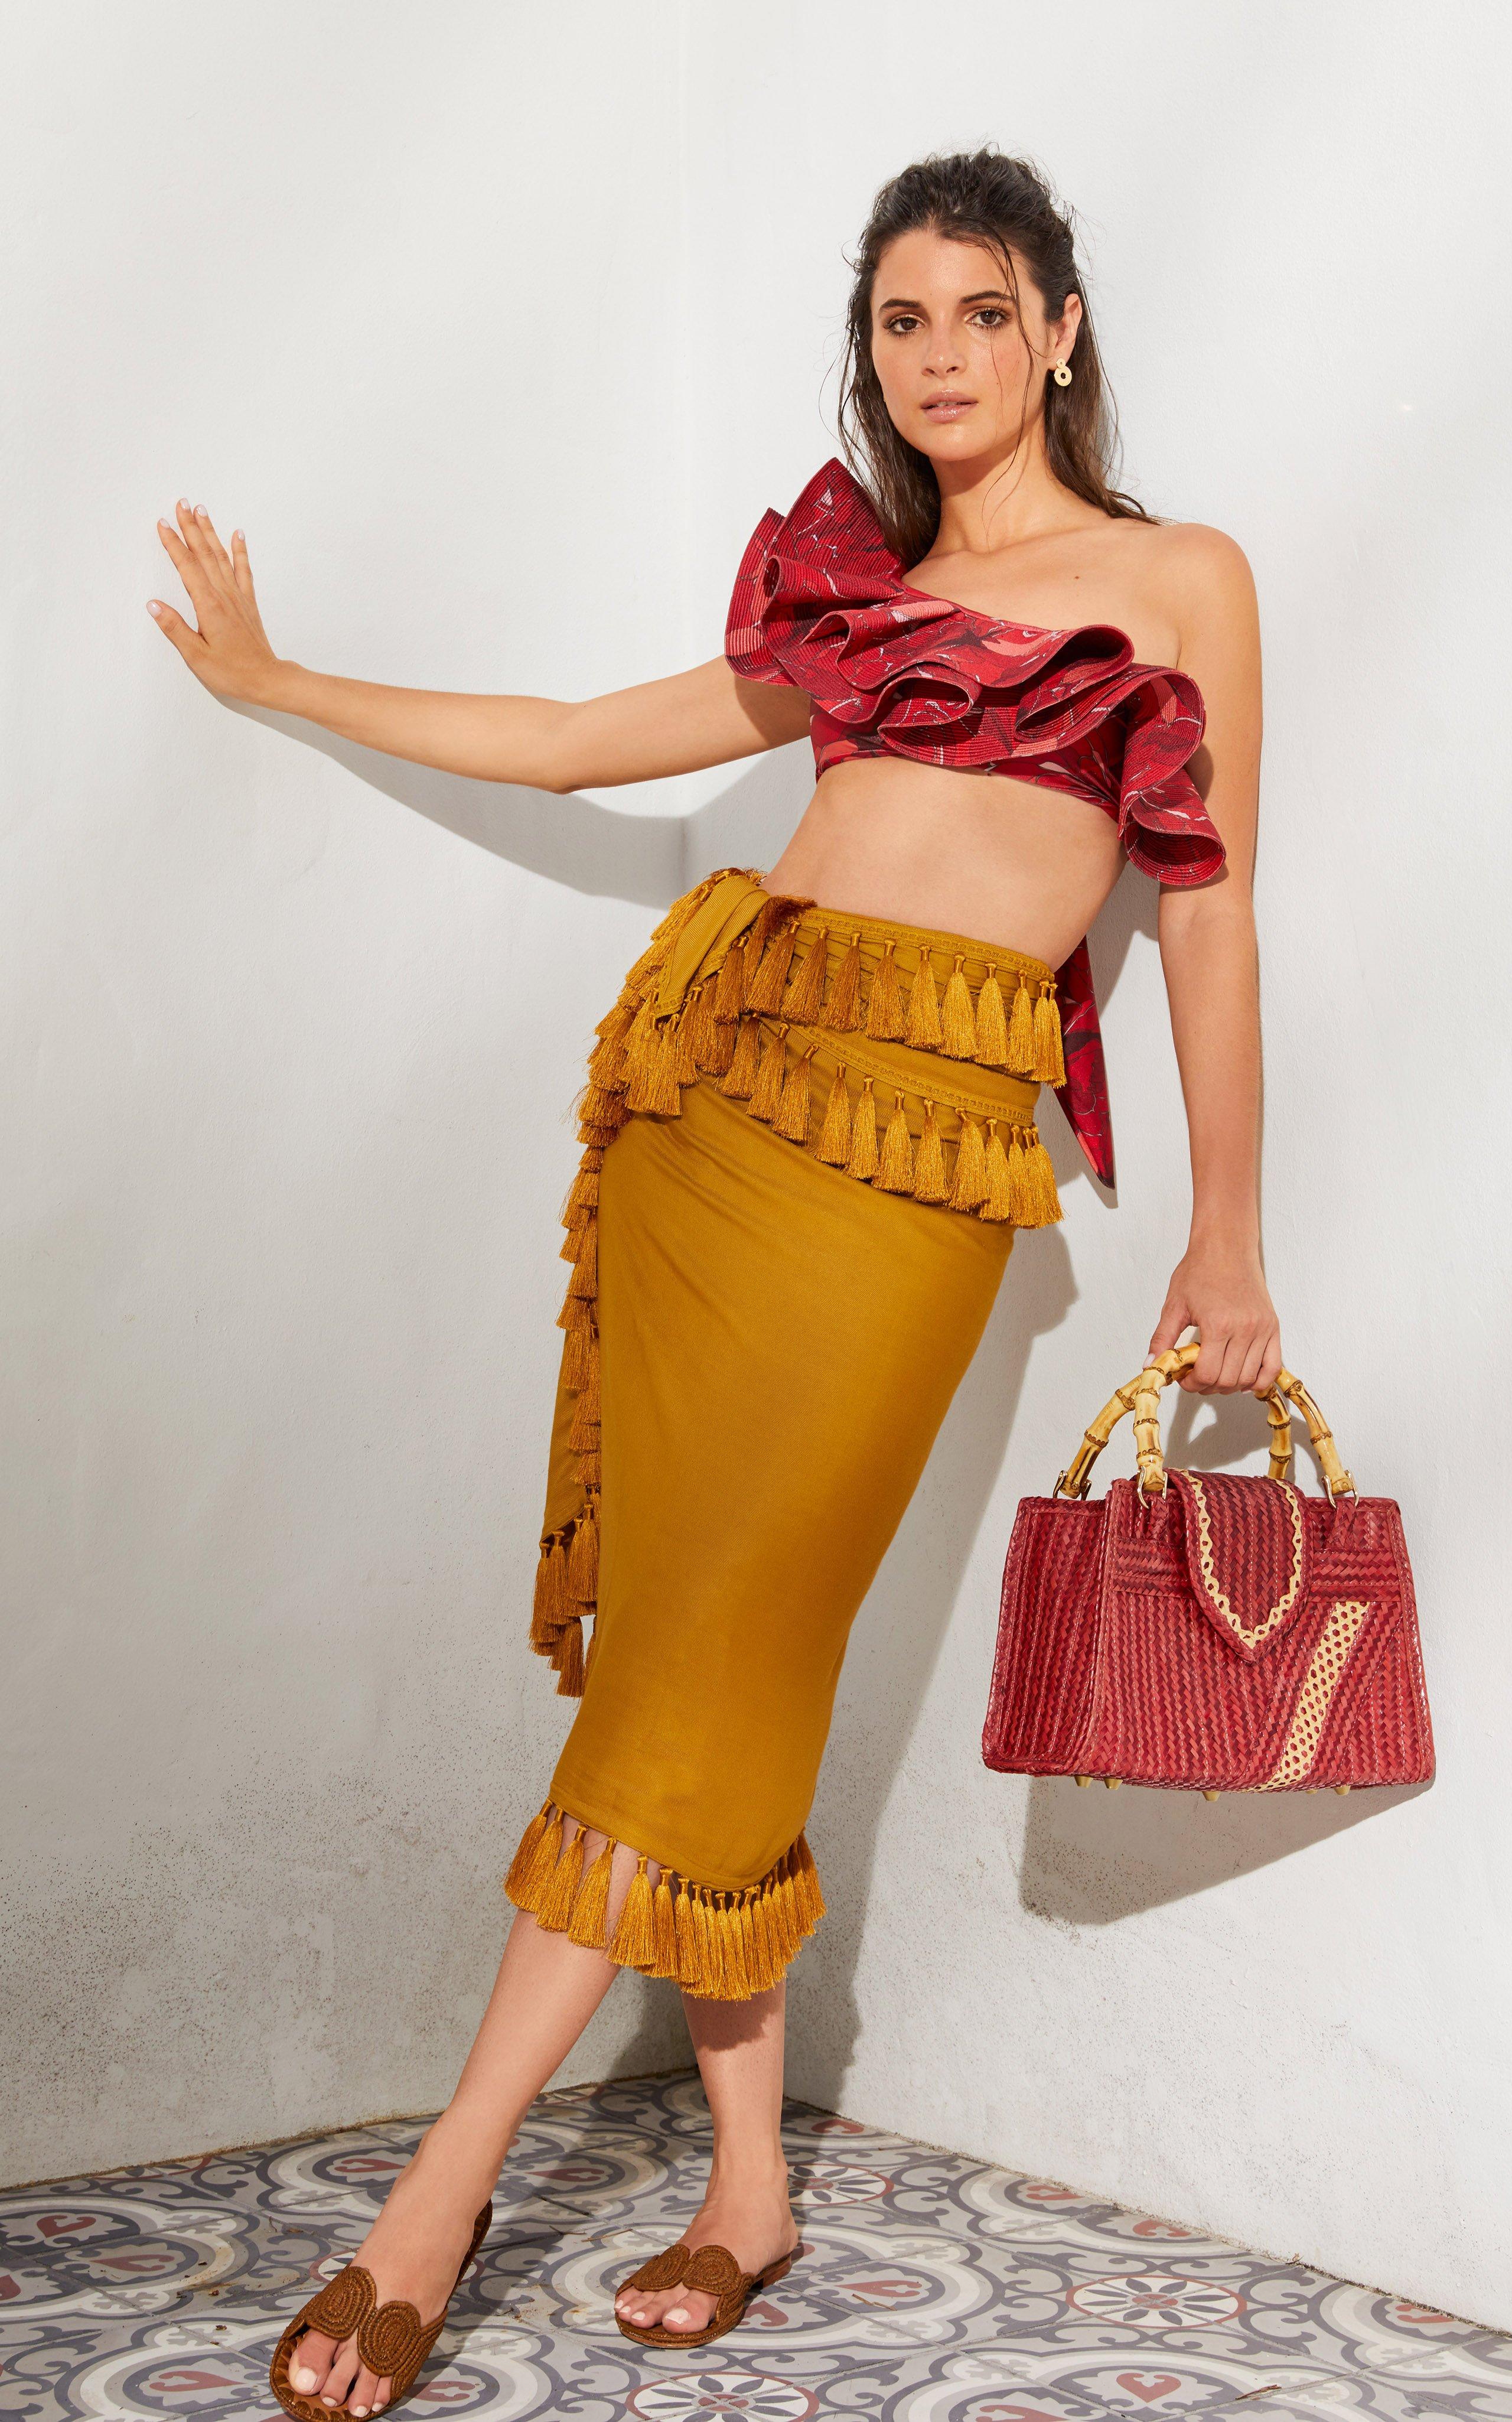 Find Your Beach Chic Style With Moda Operandi